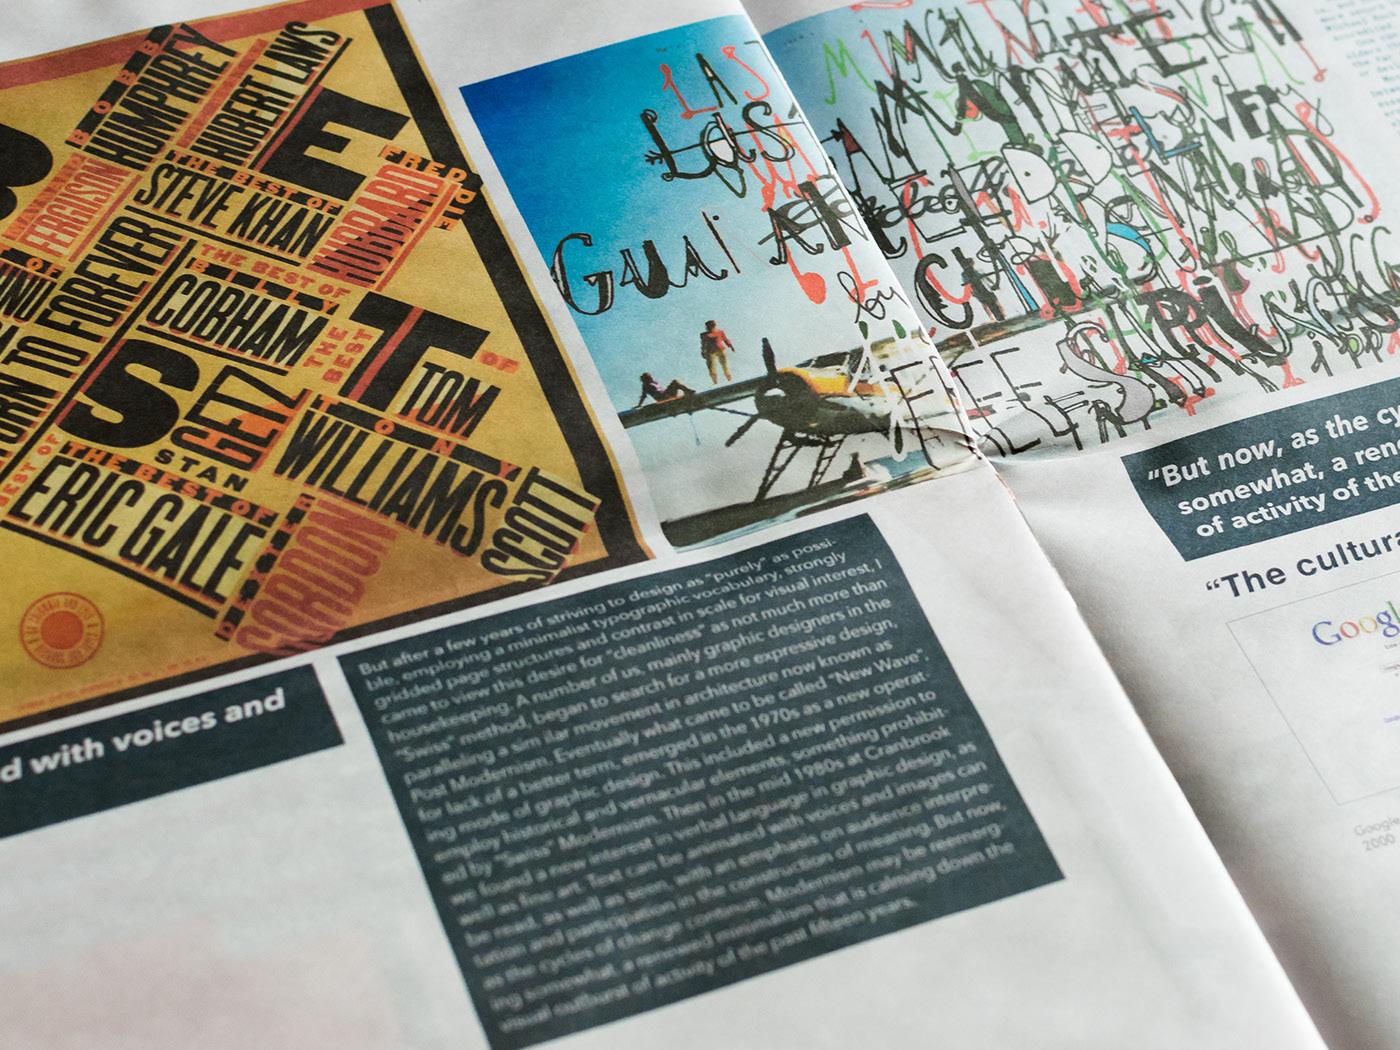 Essay on Postmodernism | Bartleby